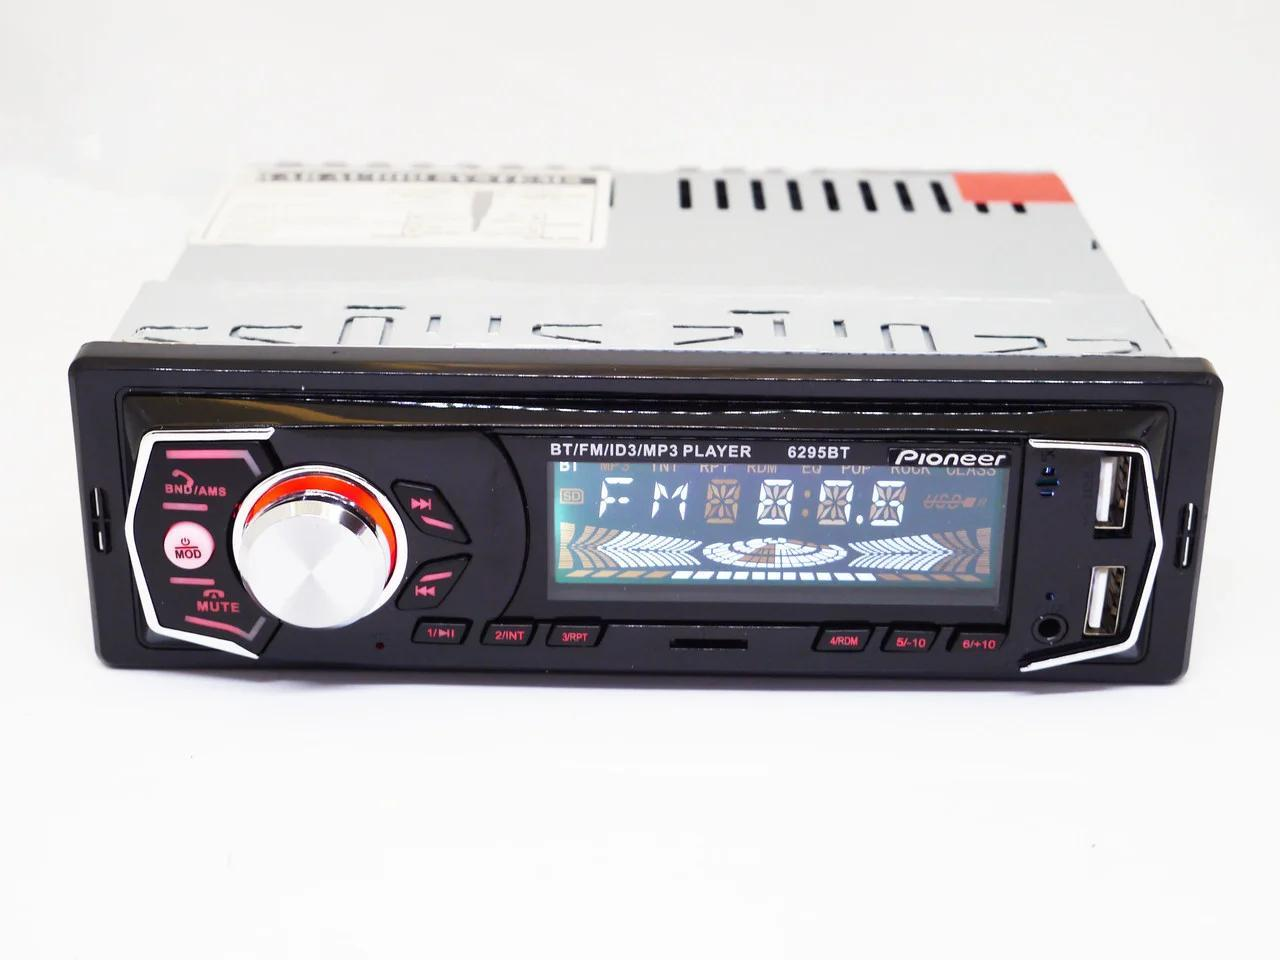 1dinАвтомагнитолана 2 USBPioneer 6295 BT(магнитола пионер с Bluetooth + 2 выхода юсб) (copy) + ПОДАРОК!